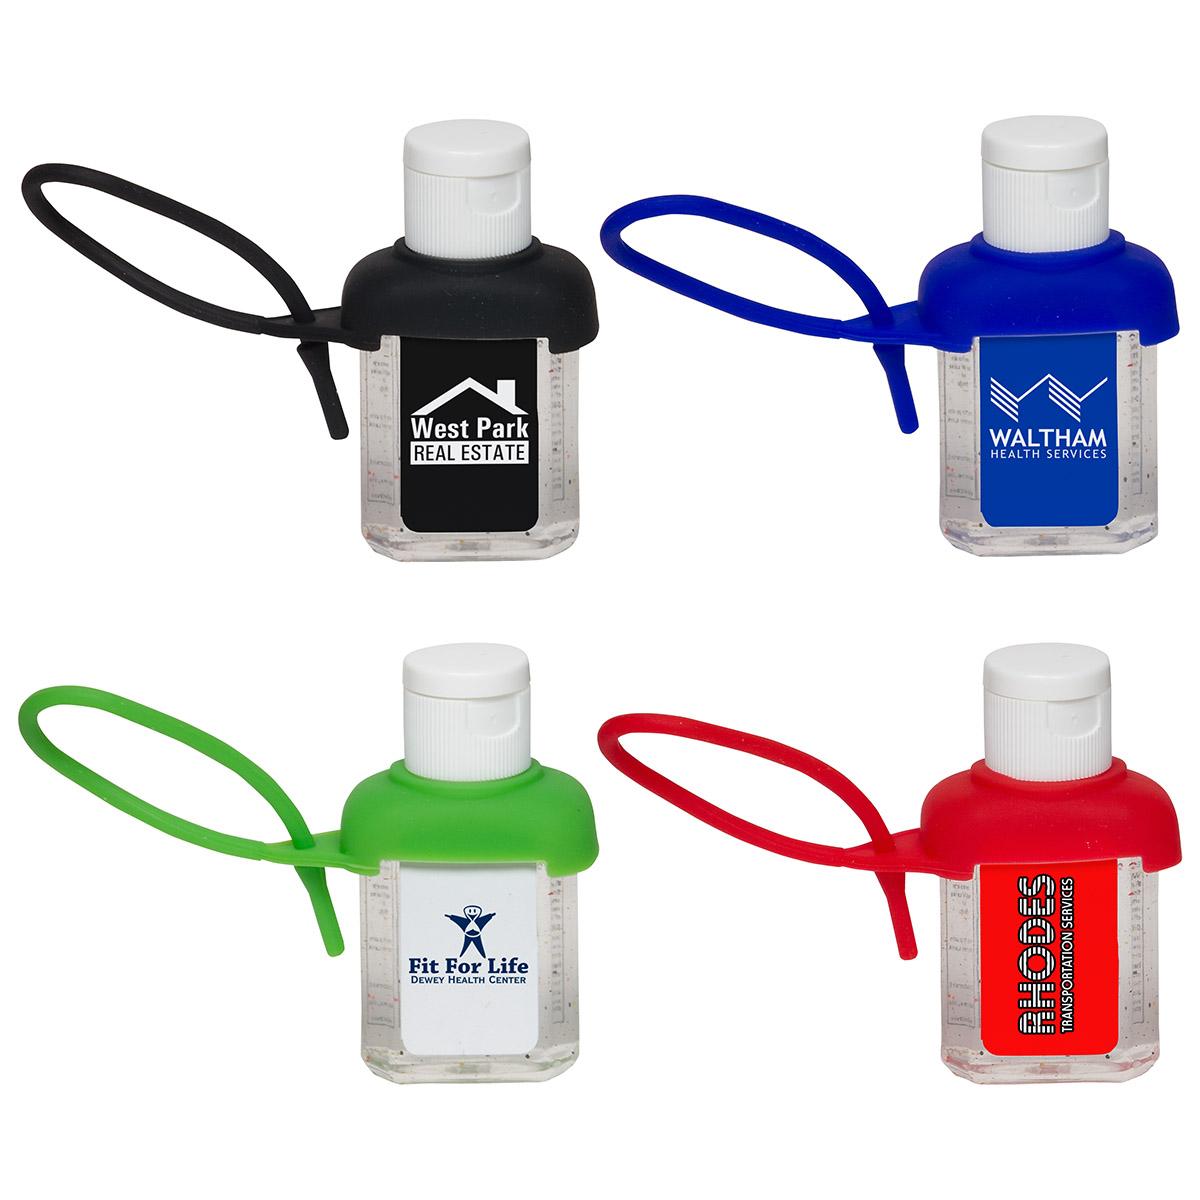 1 Oz. Caddy Strap Moisture Bead Hand Sanitizer, WSA-CO16 - 1 Colour Imprint